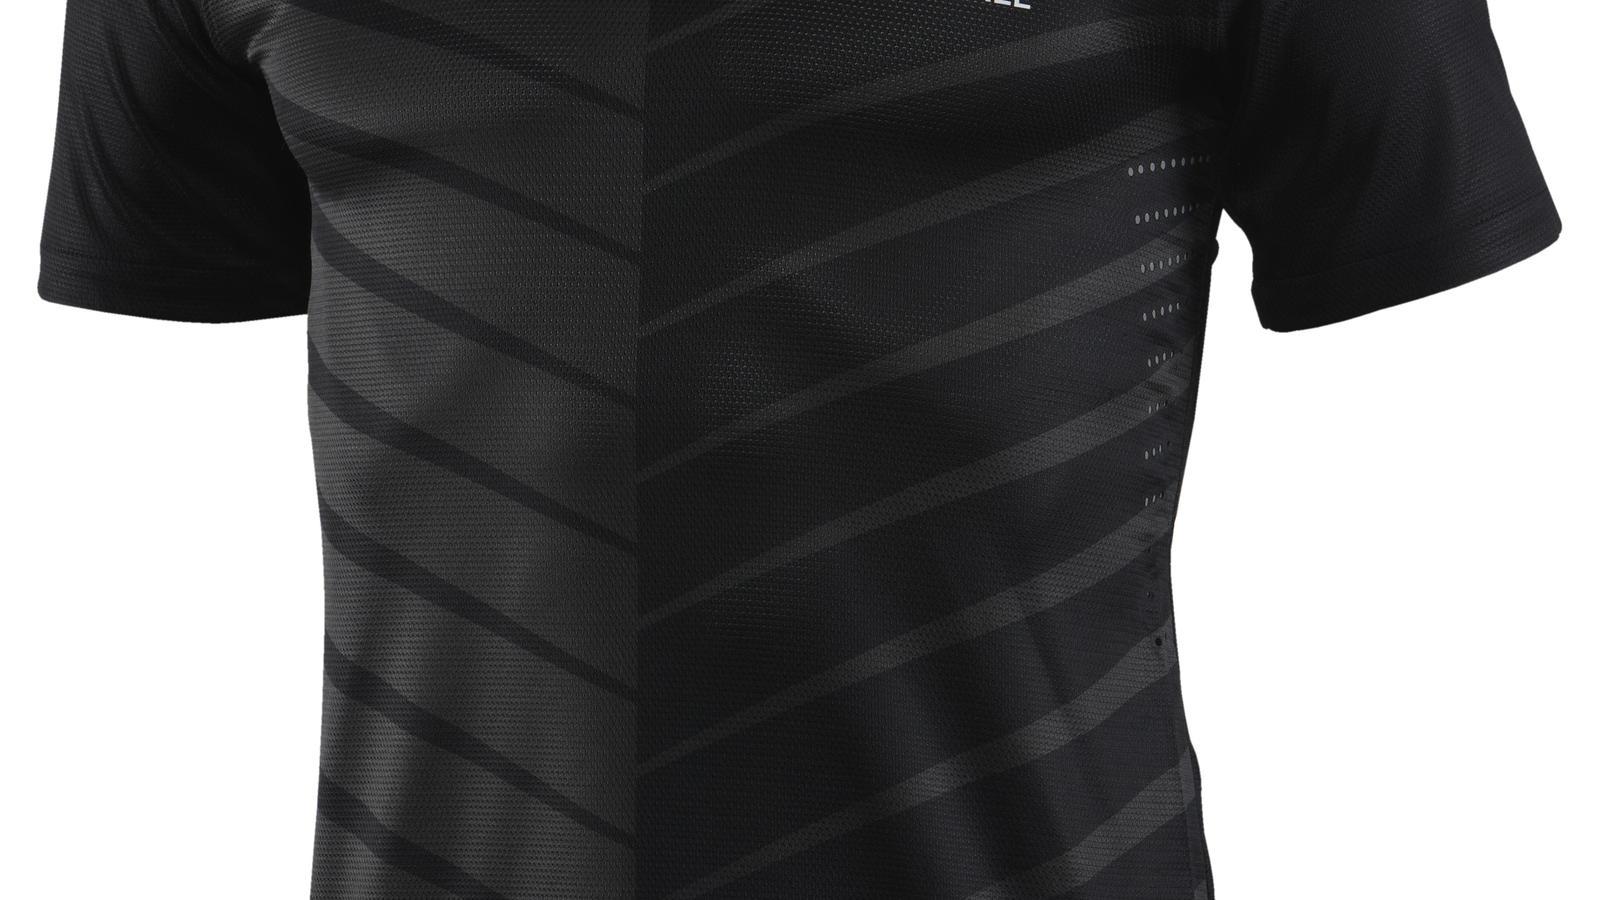 Design t shirt new zealand - Share Image The New Zealand